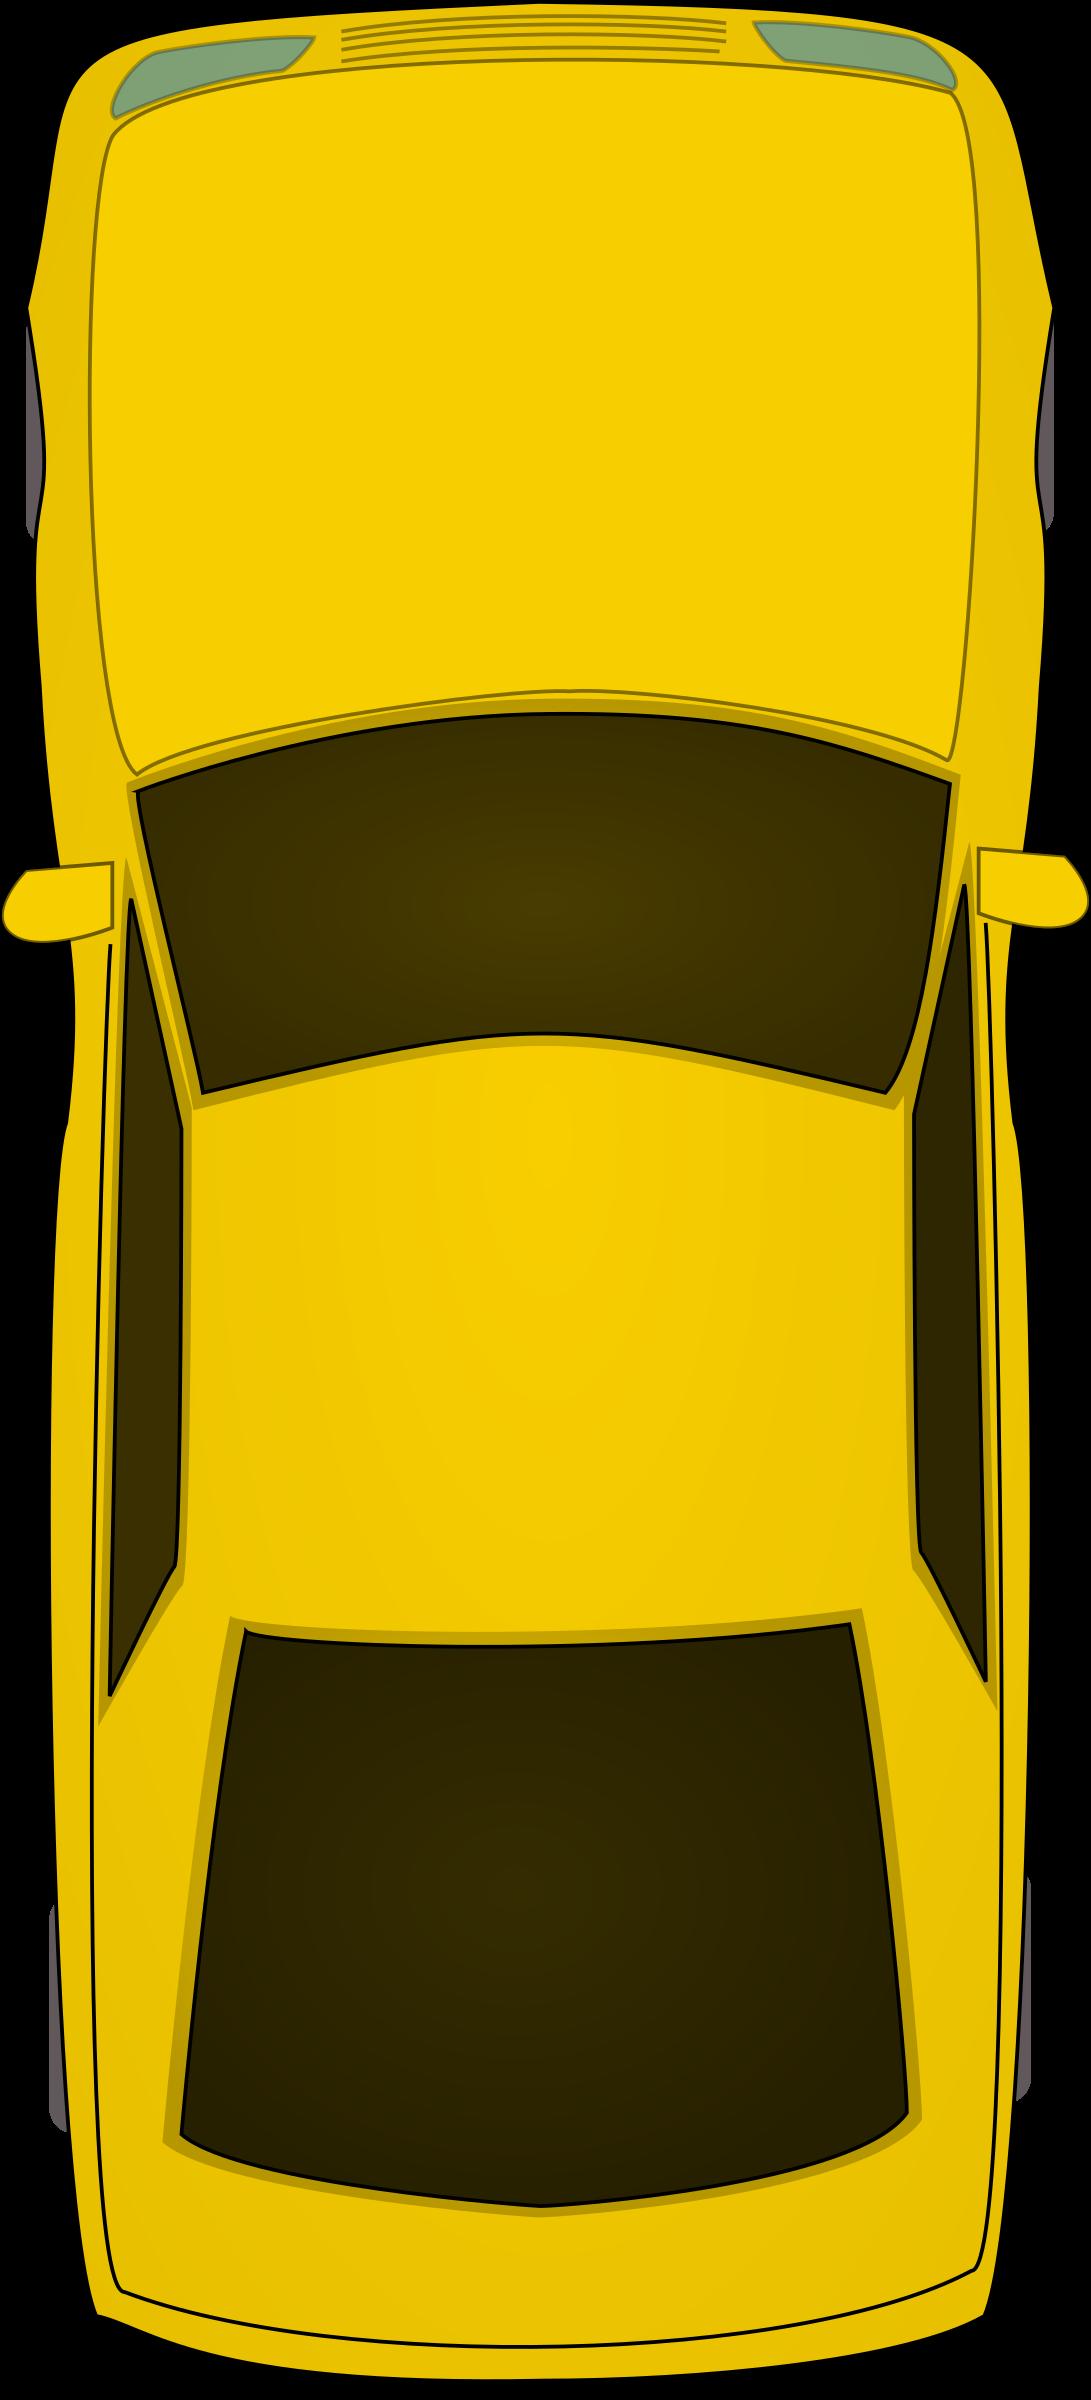 Car big image png. Door clipart top view